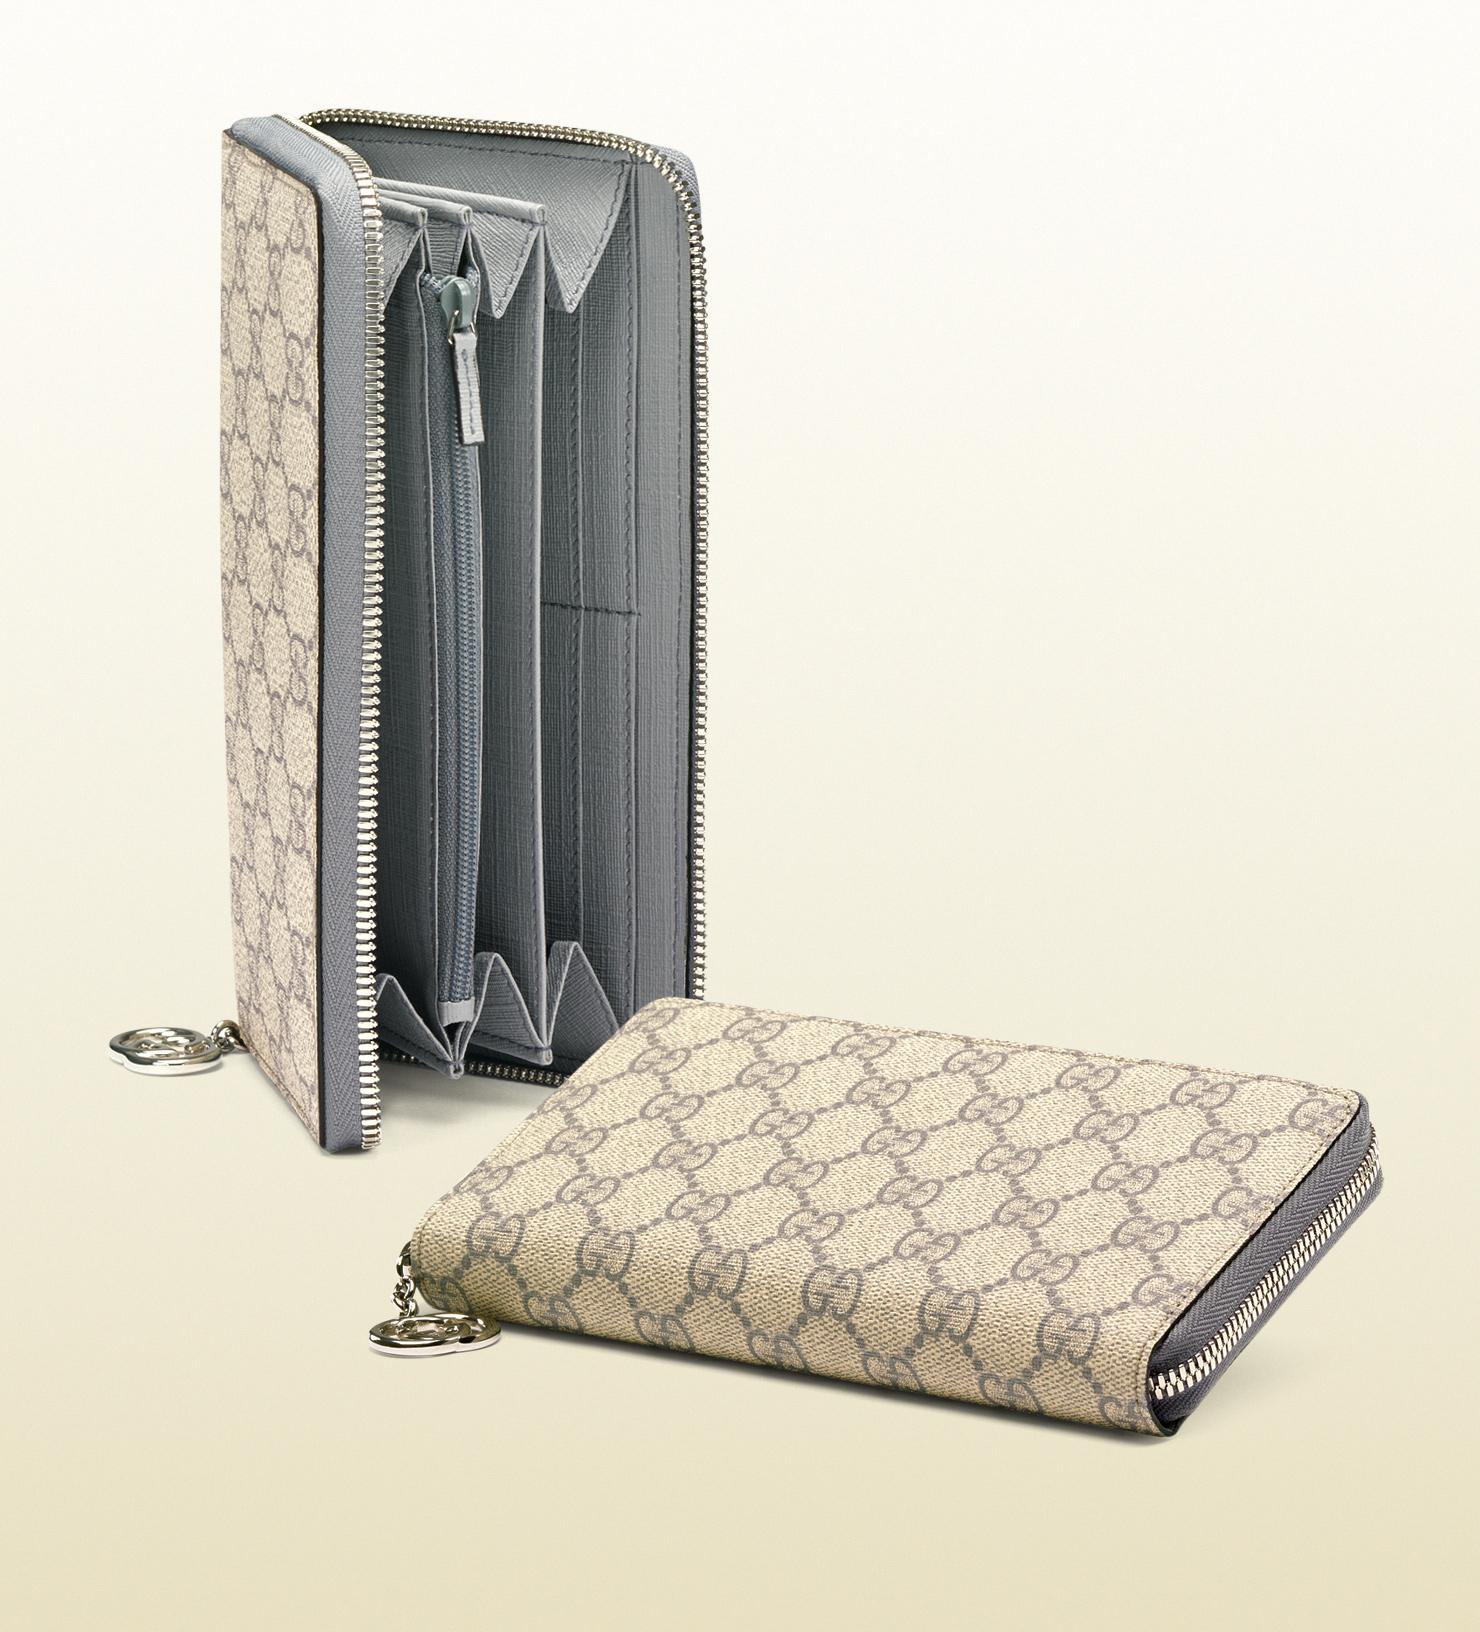 27c4cbe9551c22 Gucci Gg Supreme Canvas Zip Around Wallet in Gray for Men - Lyst